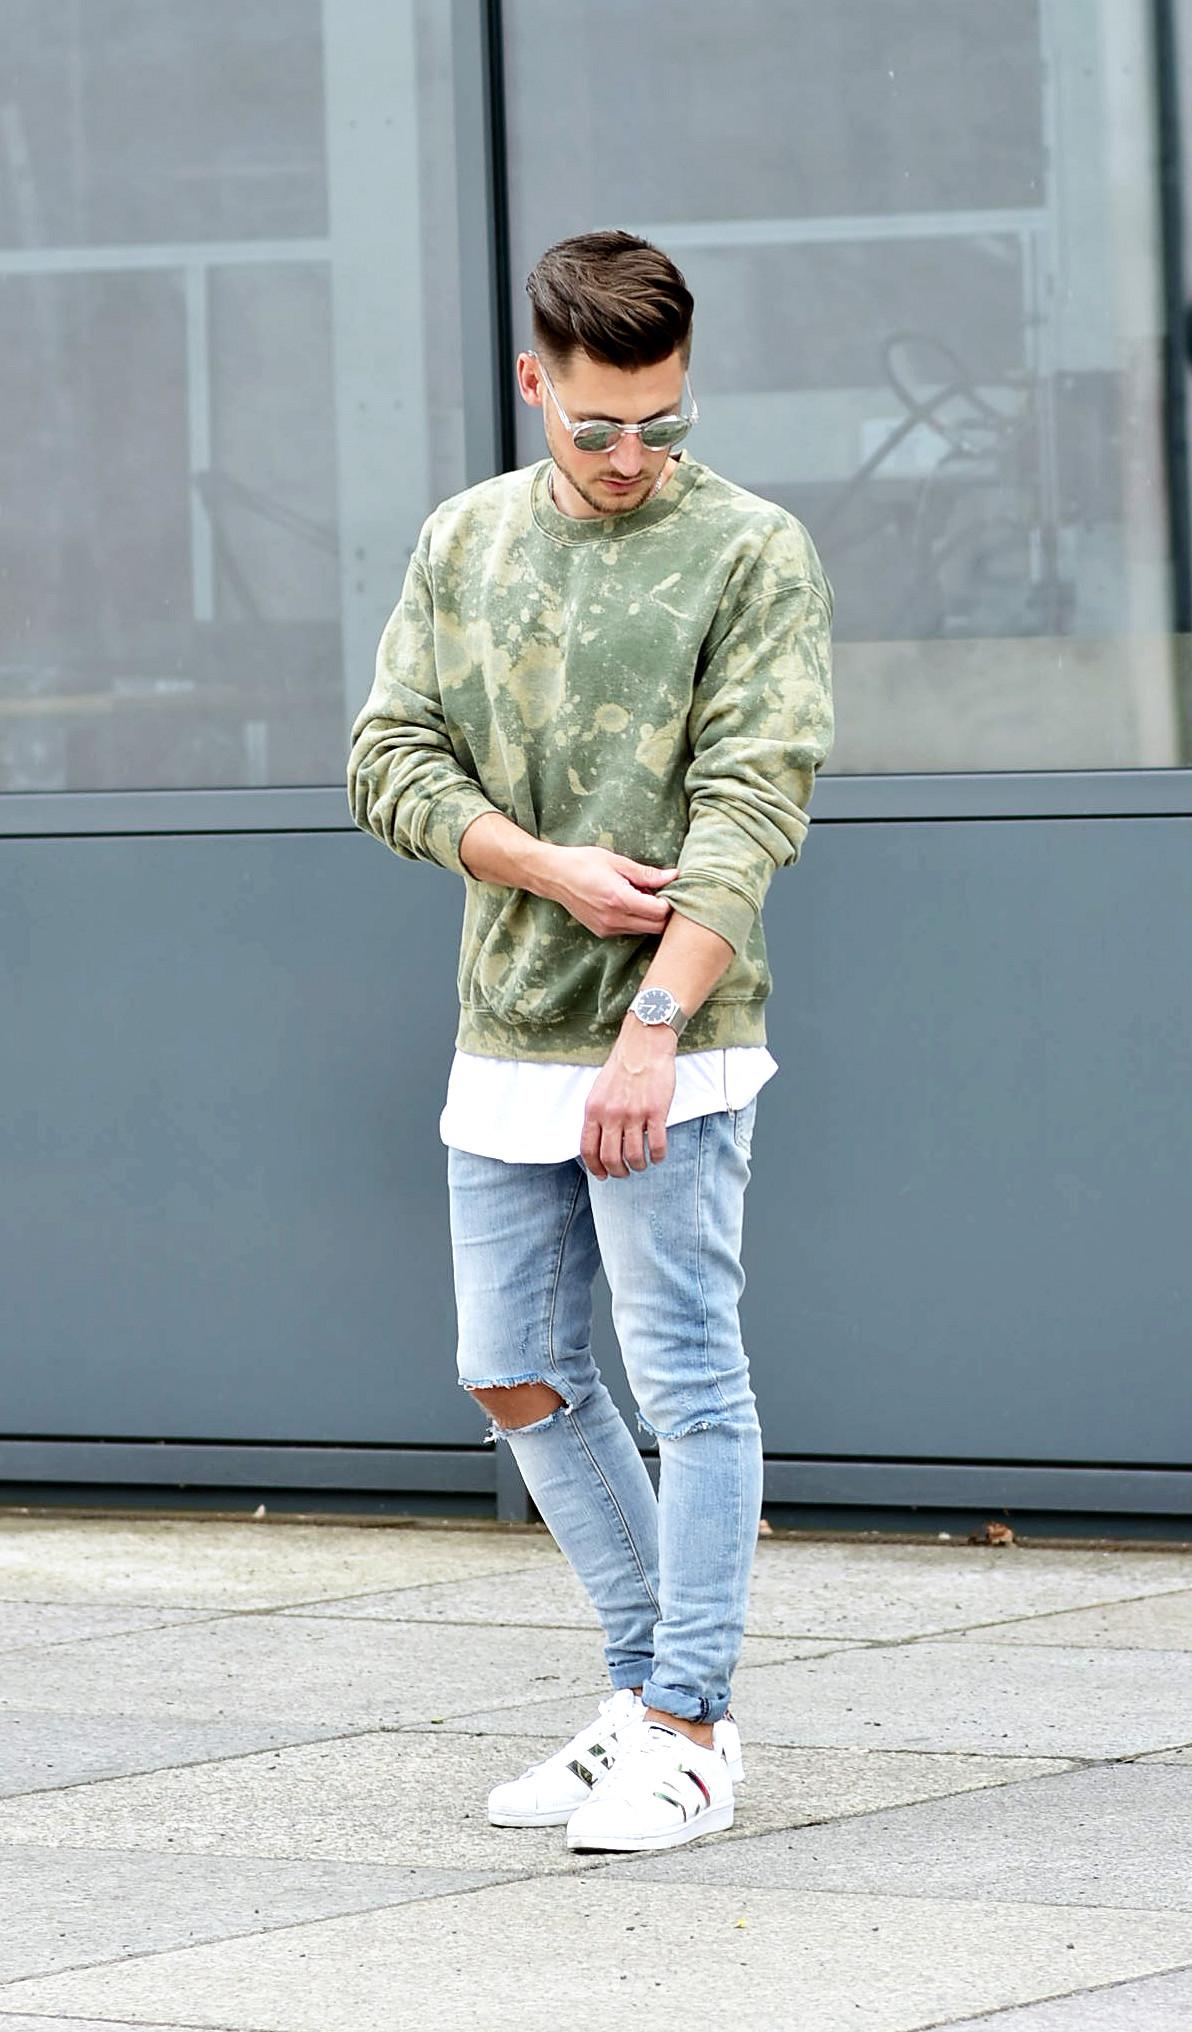 Tommeezjerry-Styleblog-Männerblog-Männer-Modeblog-Berlin-Berlinblog-Outfit-Streetlook-Vintage-Retro-Oversized-Adidas-Superstar-Skinny-Jeans-Camouflage-Military